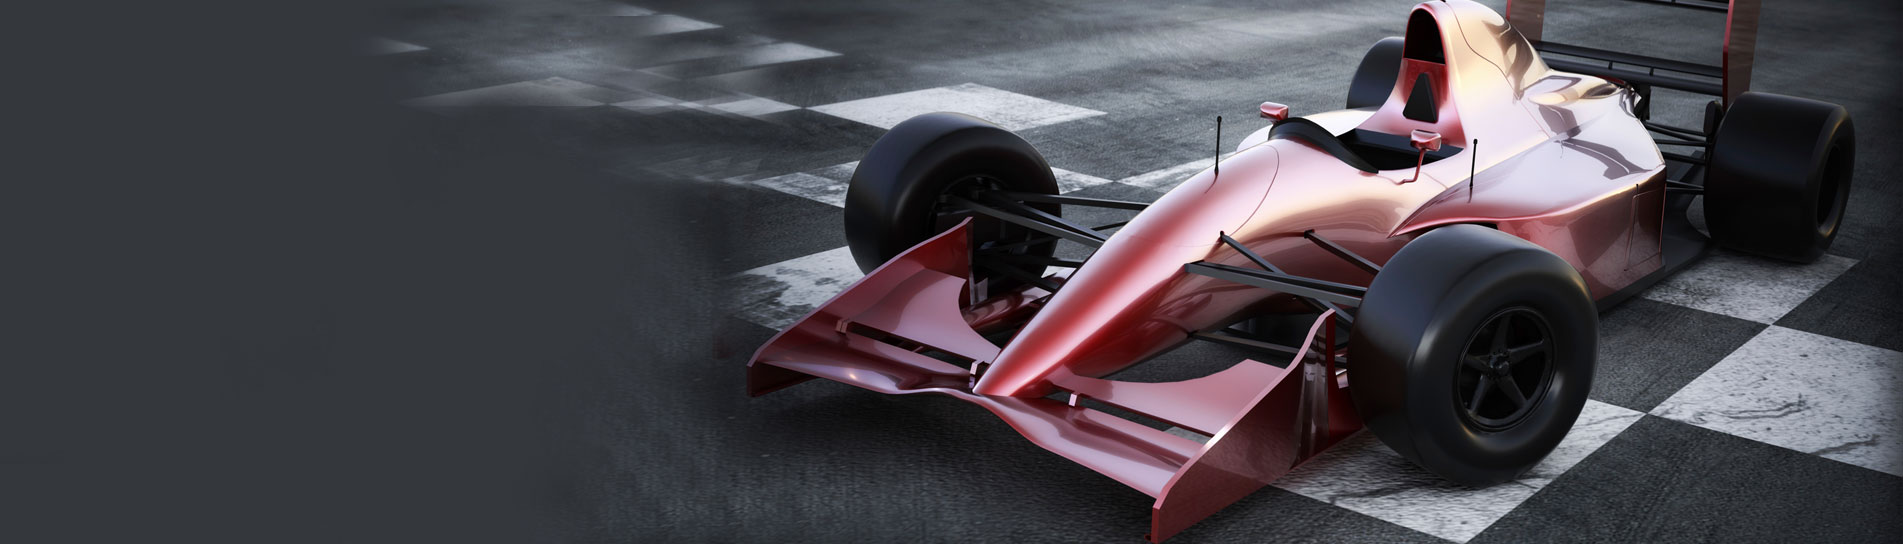 Automotive Engineering Plastics